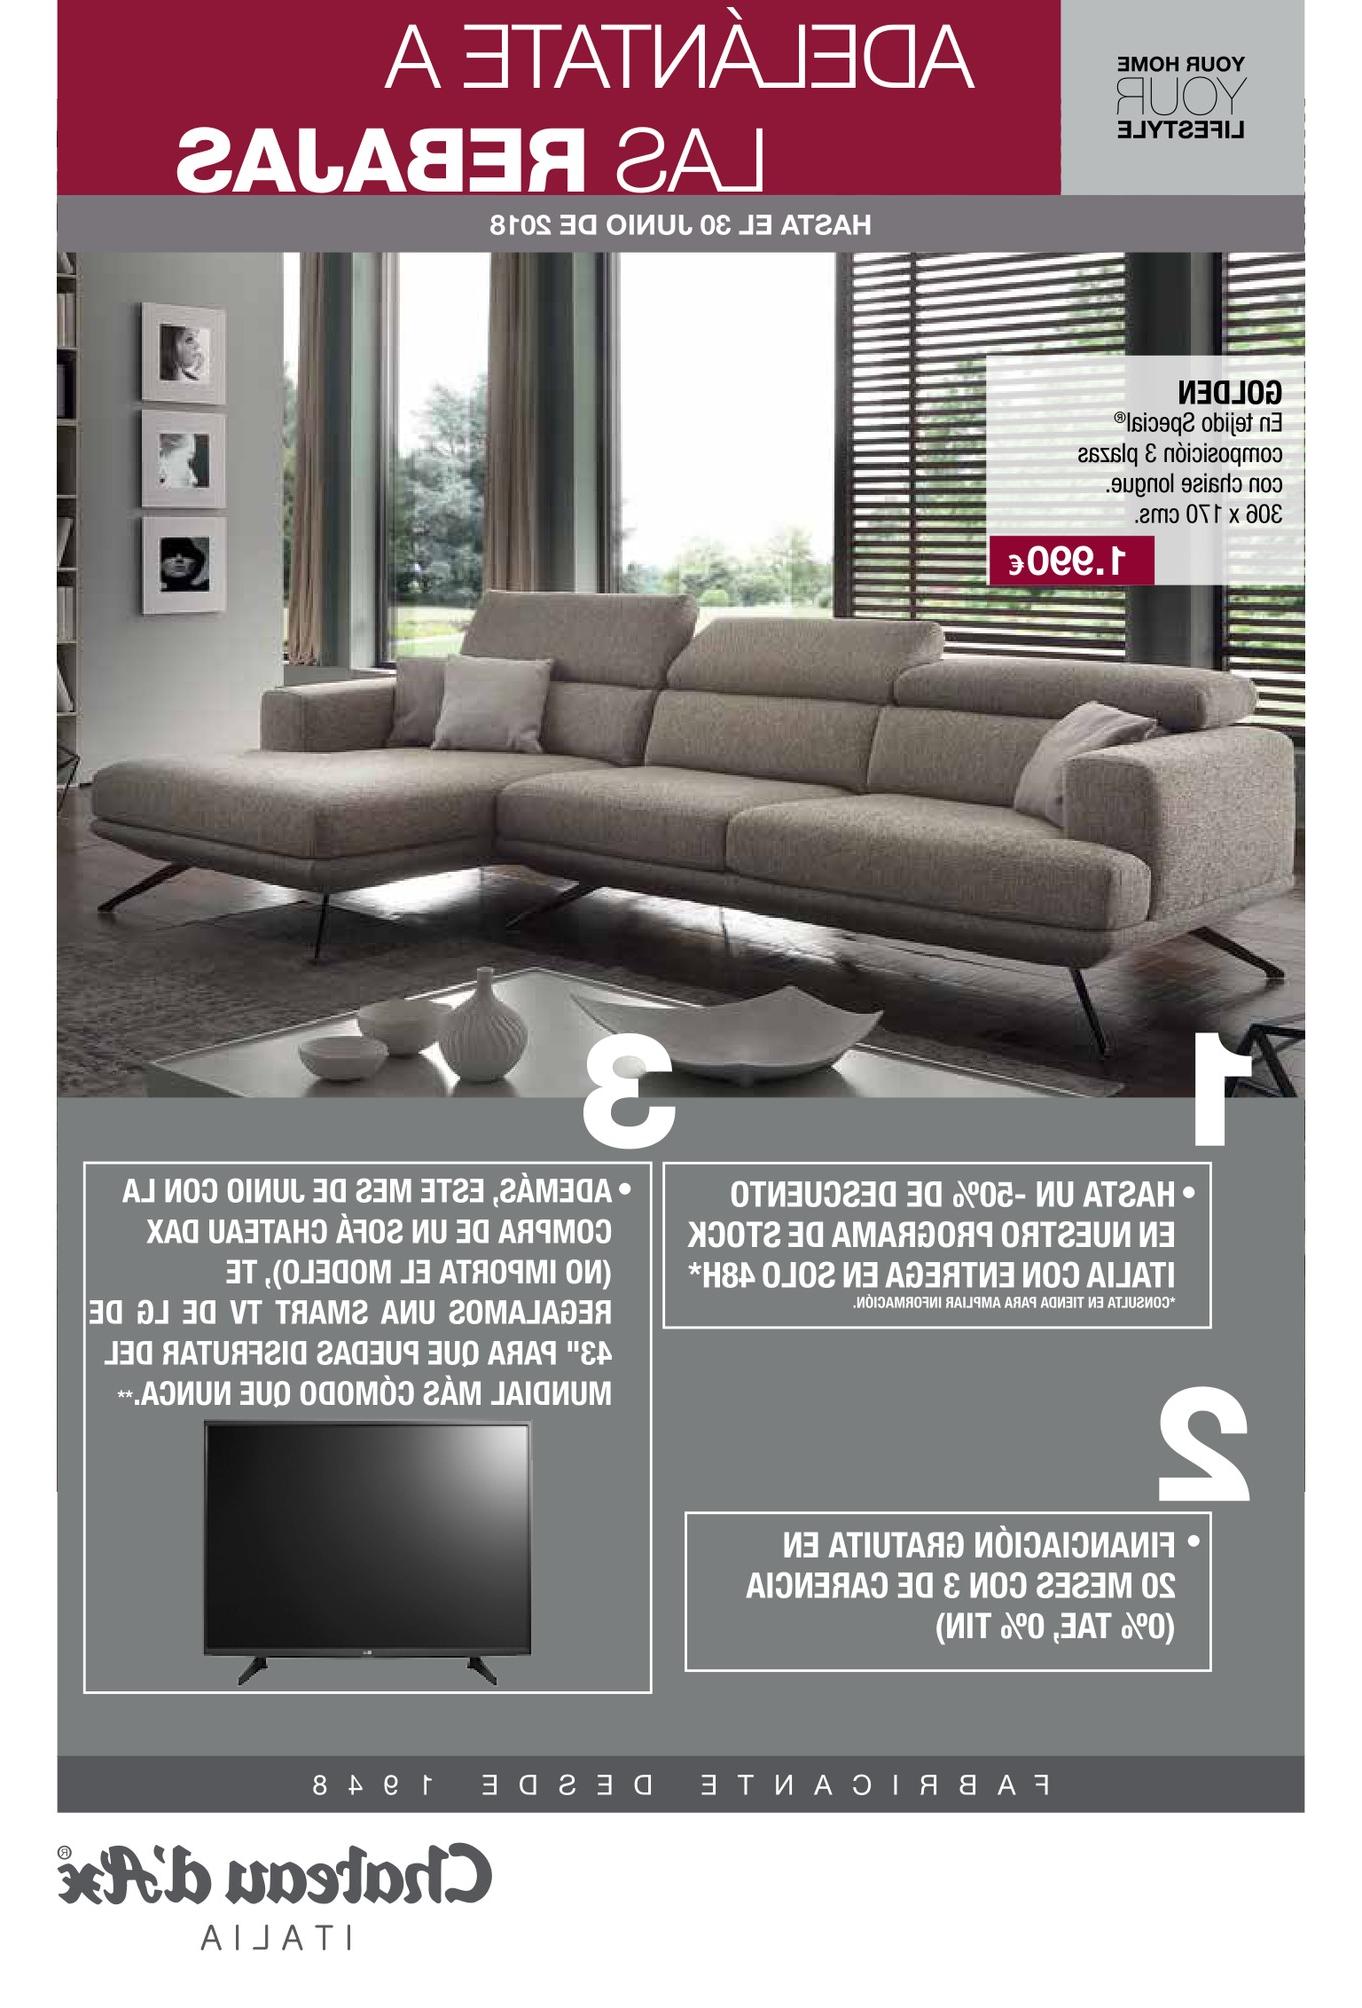 Stock sofas Carretera toledo Dddy Chateau D Ax Ofertas Madrid toledo Sabadell Badal Zs Pub